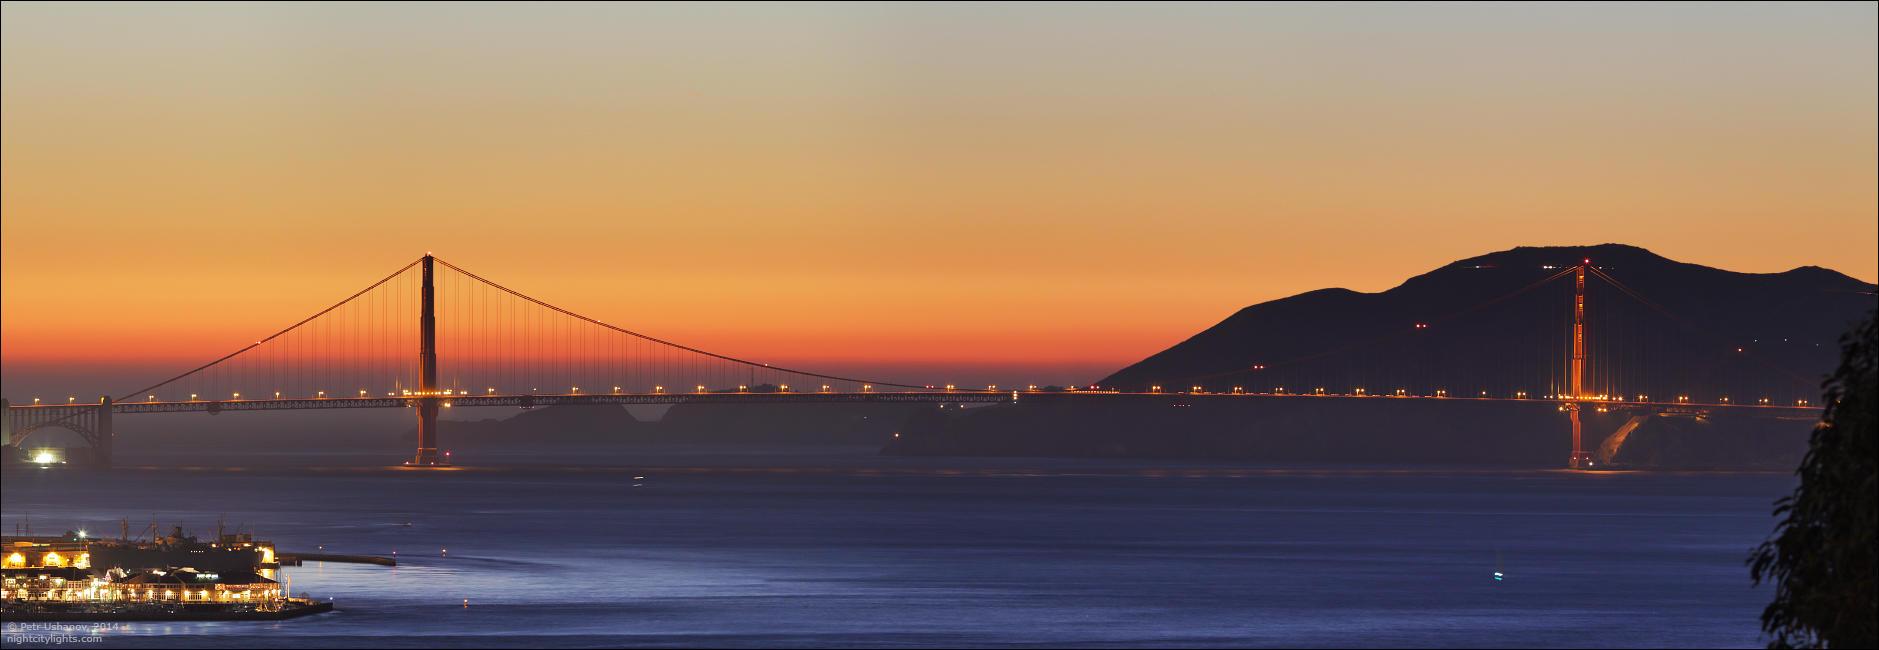 SFpanorama04 Сан Франциско   панорамы города